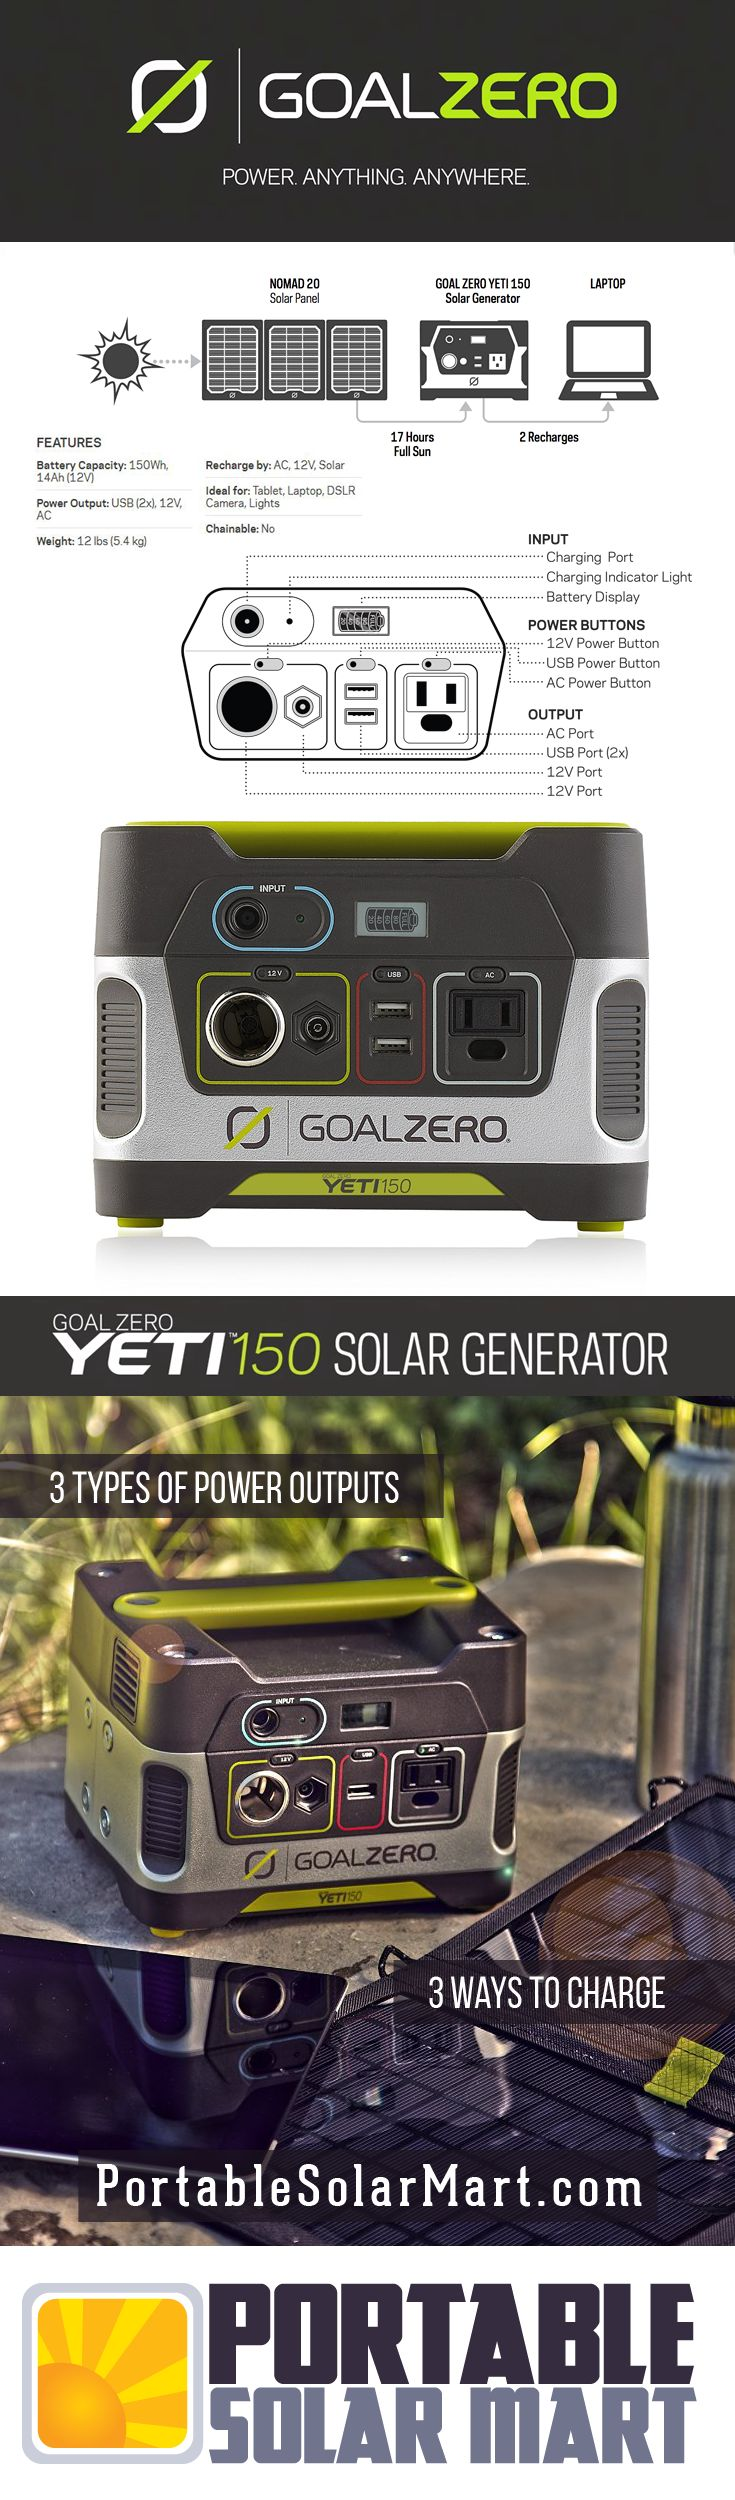 Yeti Portable Solar Generator  http://portablesolarmart.com/